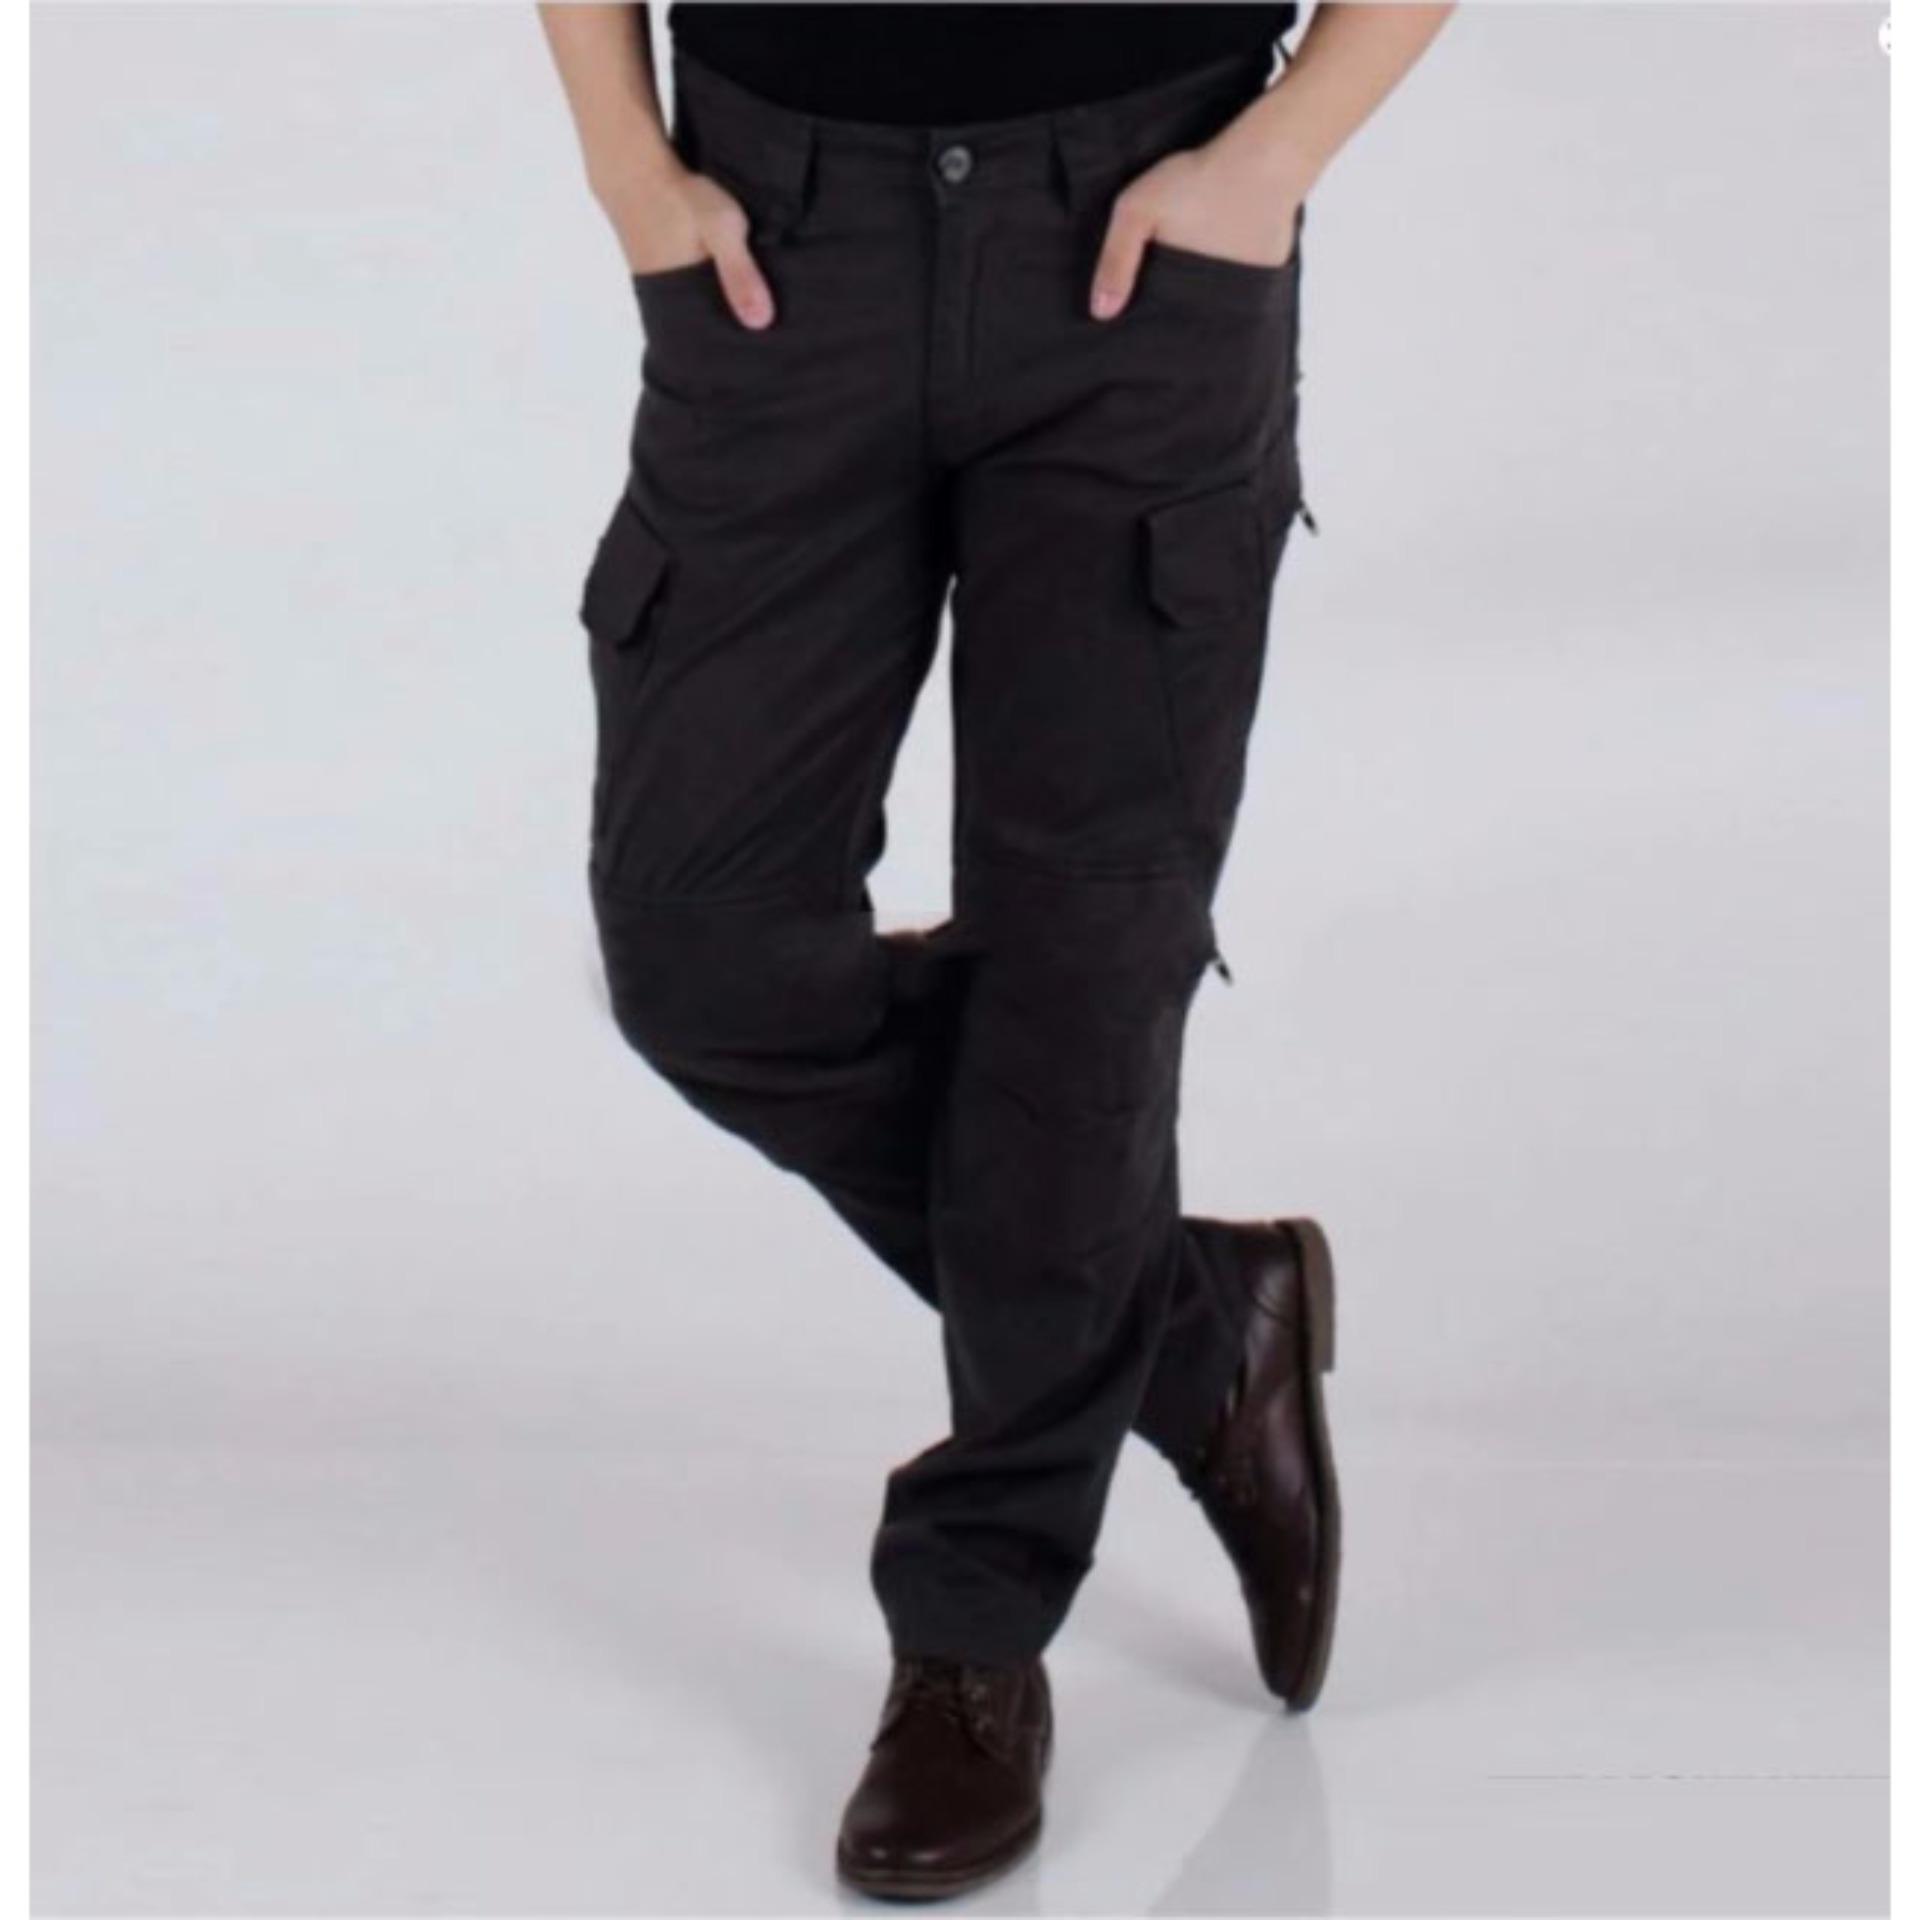 Swiss hunter - Blackhawk tactical cargo celana panjang - Black